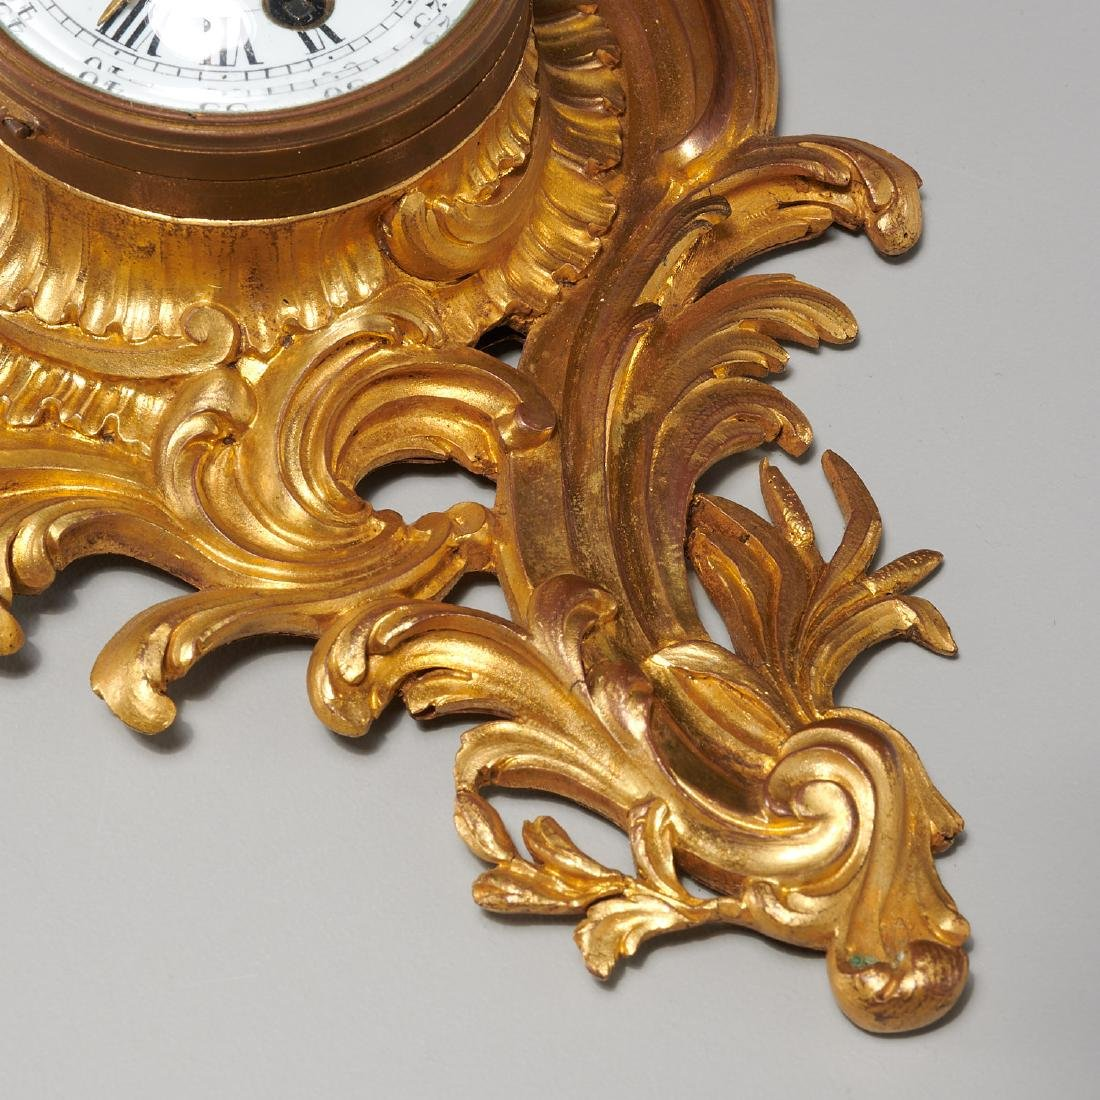 French cartel clock signed Balthazar, Paris - 5